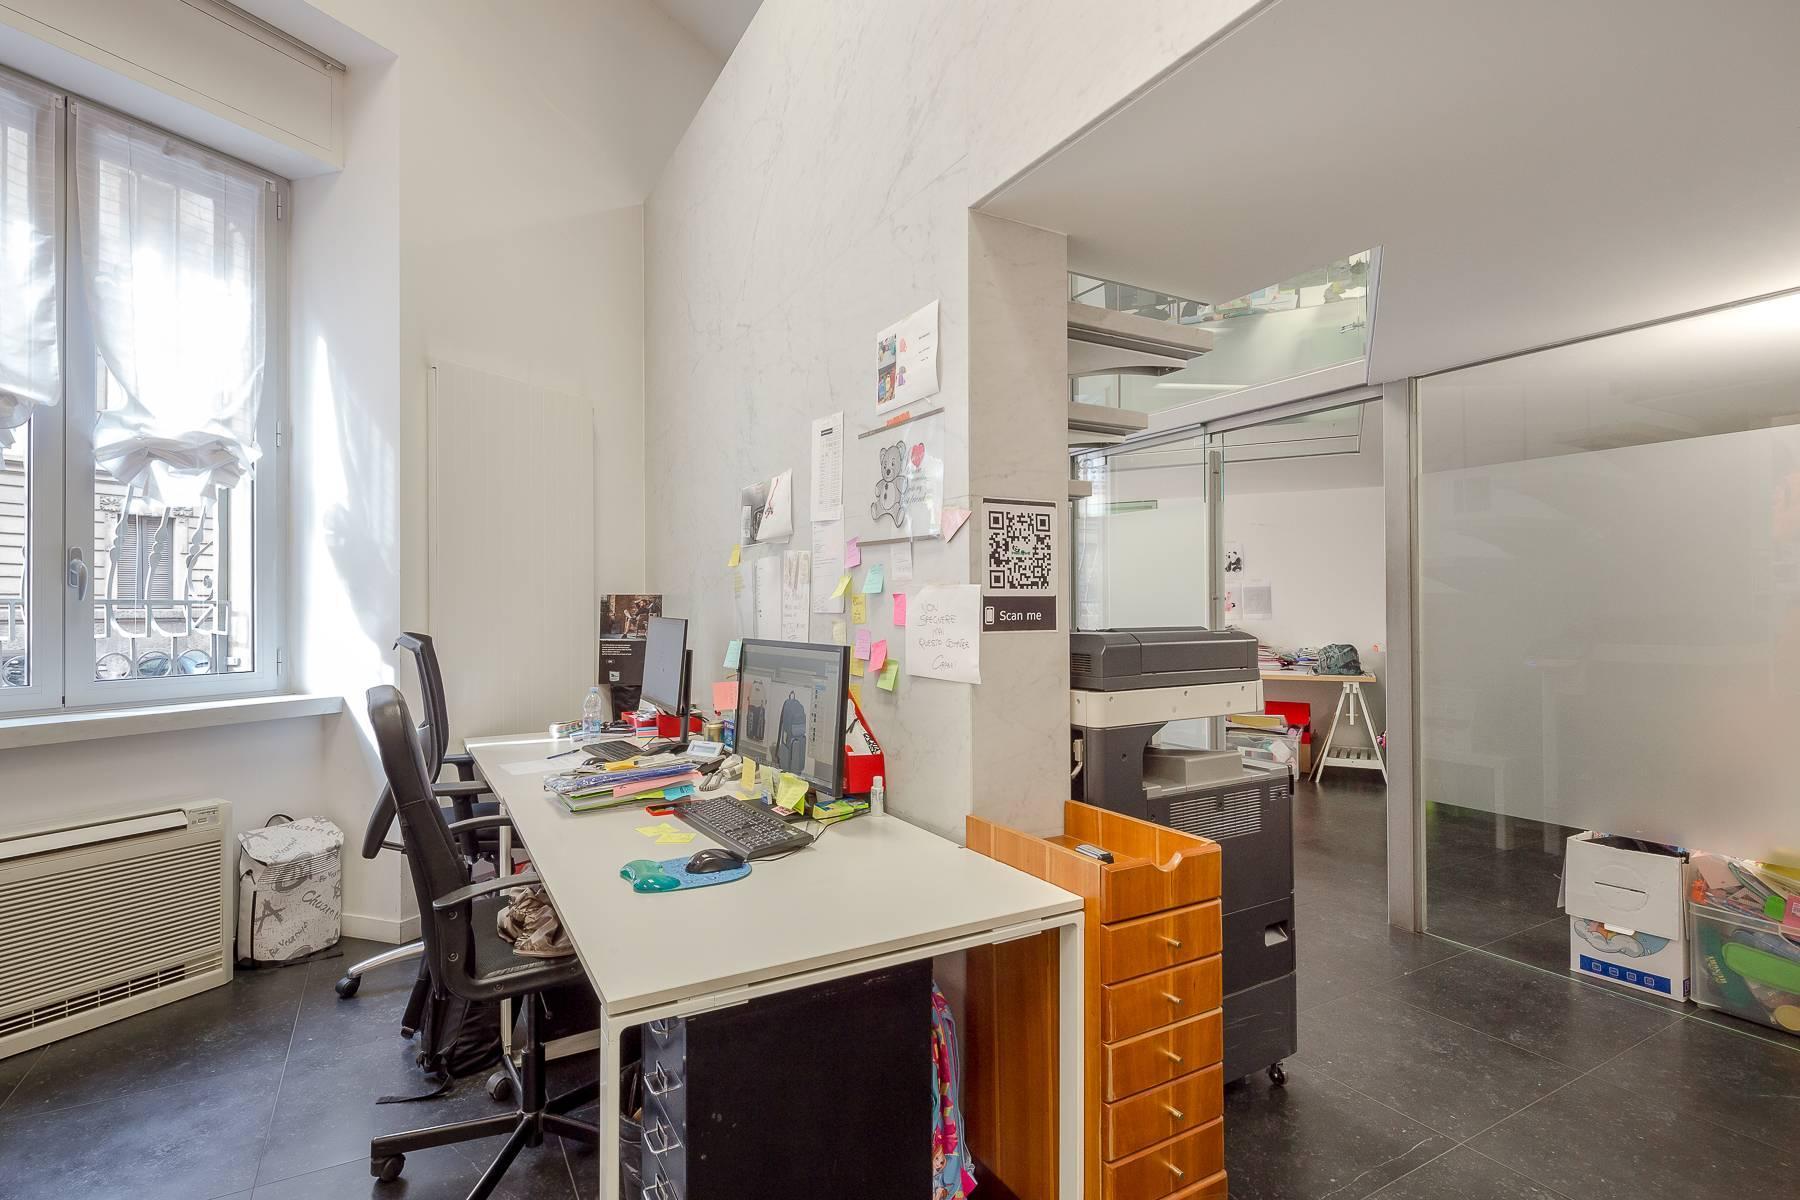 Opne-Space Büro / Wohnimmobilie auf der Piazza Giovine Italia / Via Aurelio Saffi - 21